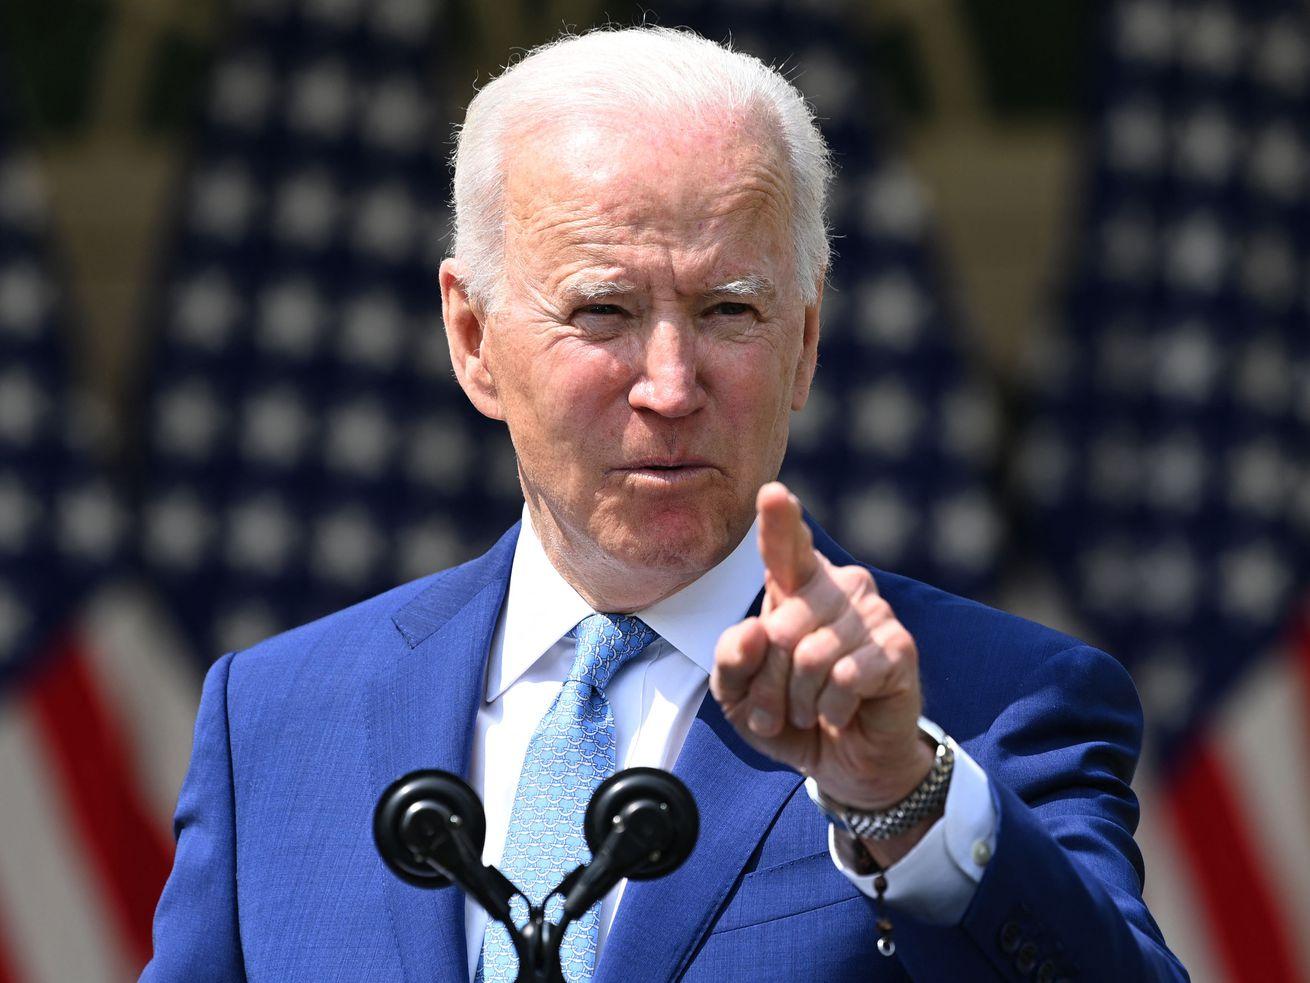 President Joe Biden speaks about gun violence at the Rose Garden of the White House in Washington, DC, on April 8, 2021.